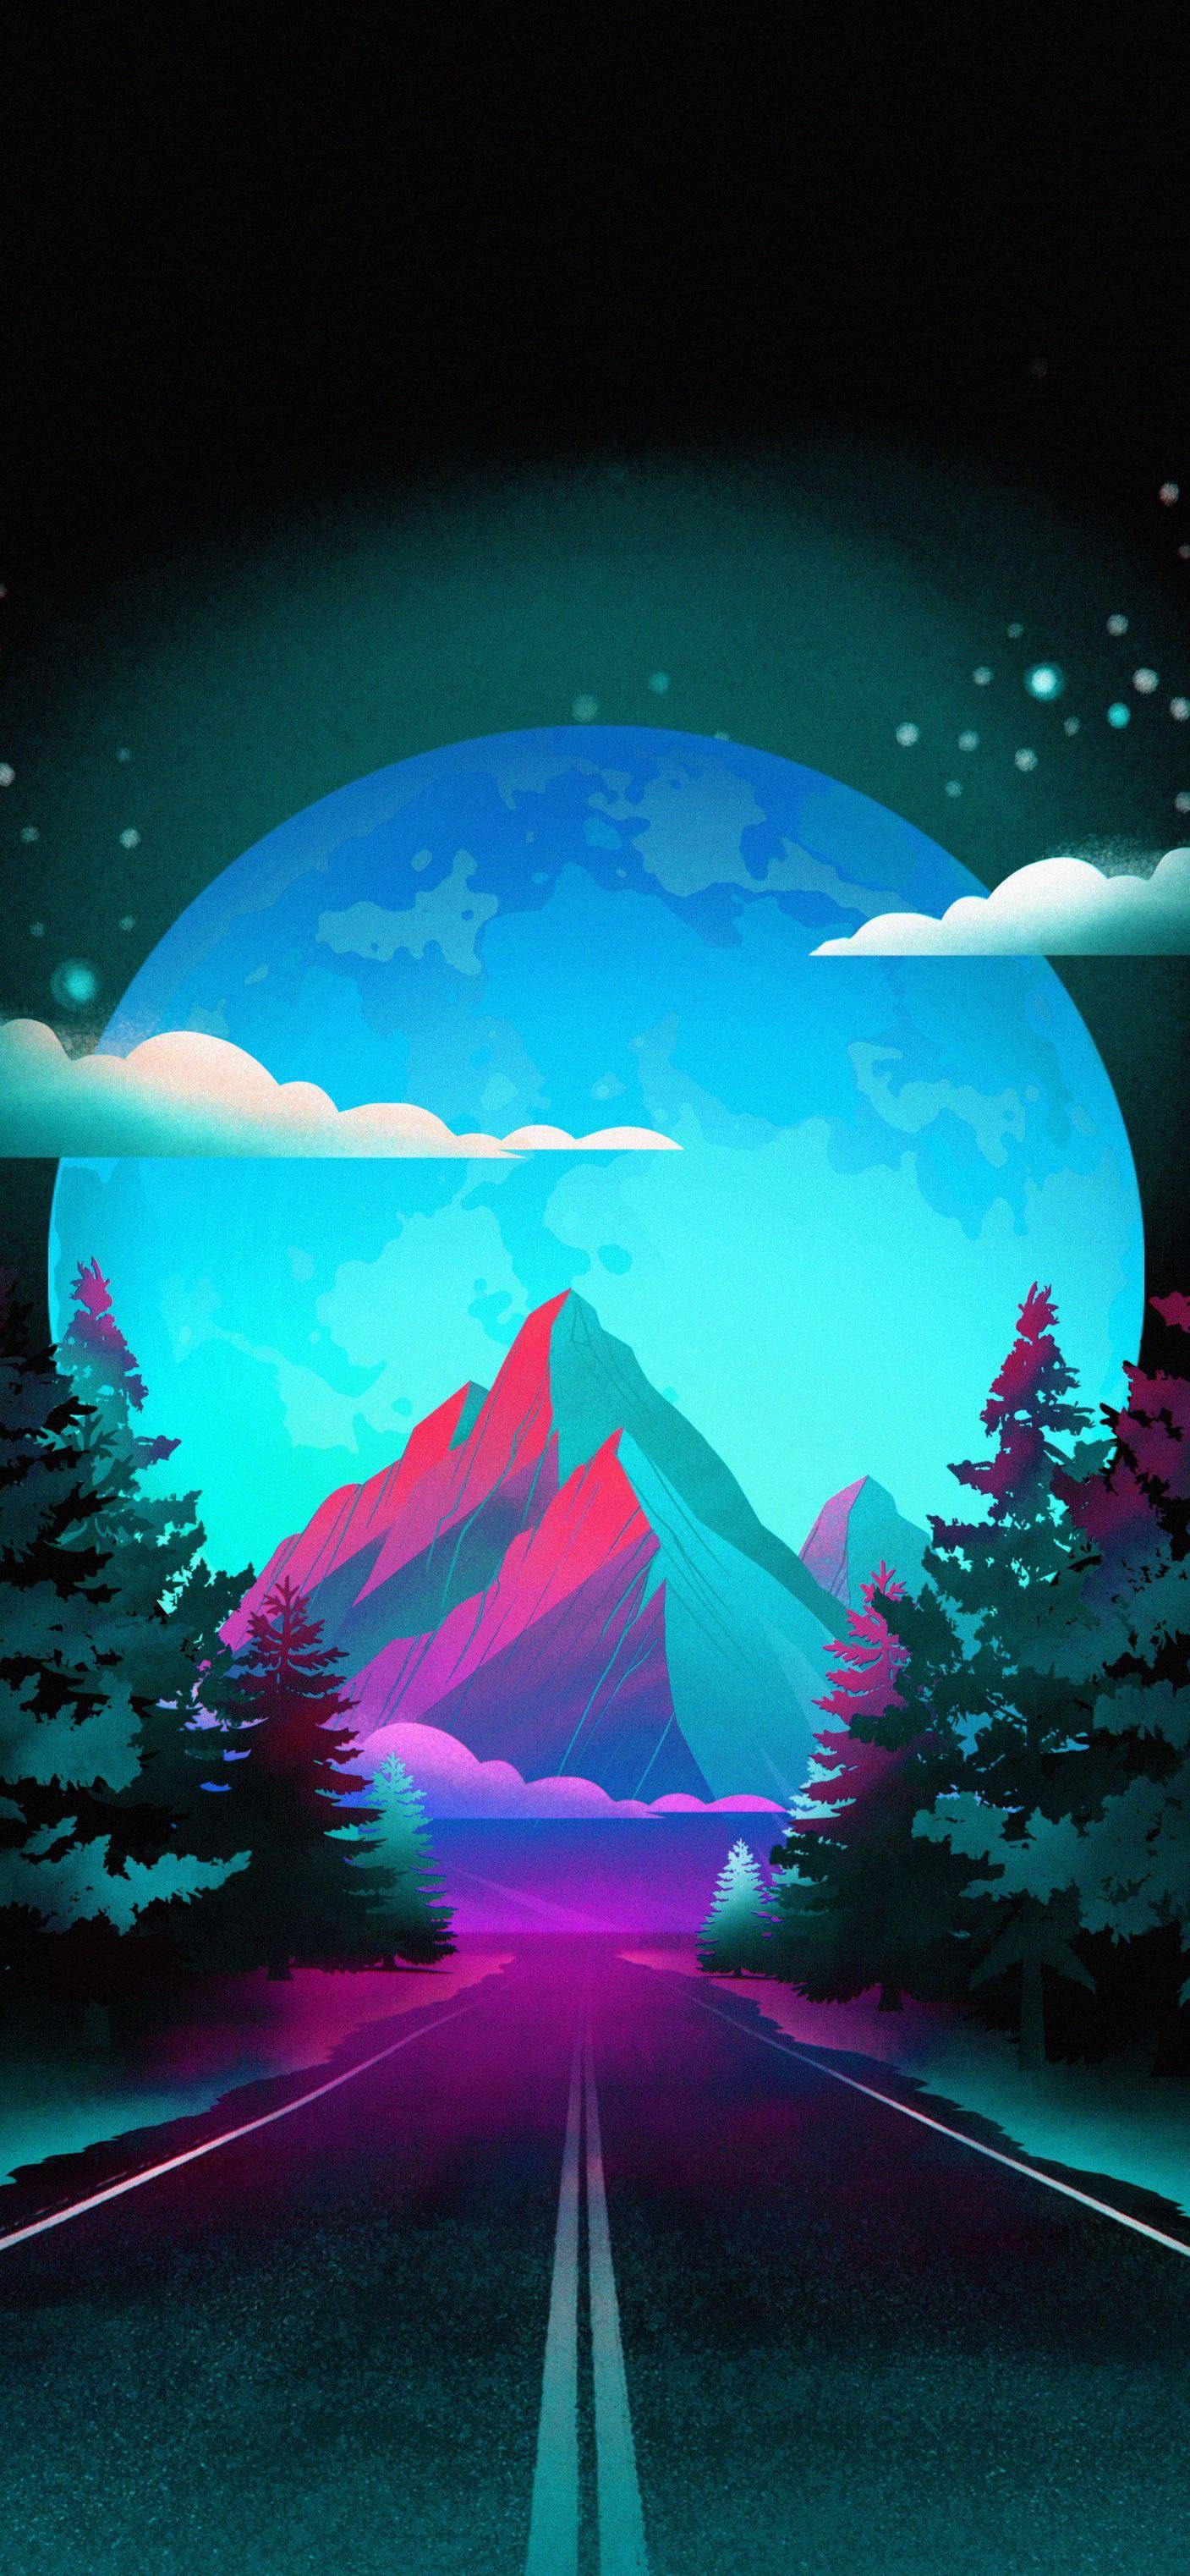 Mountain Road in 2020 Inspirational phone wallpaper